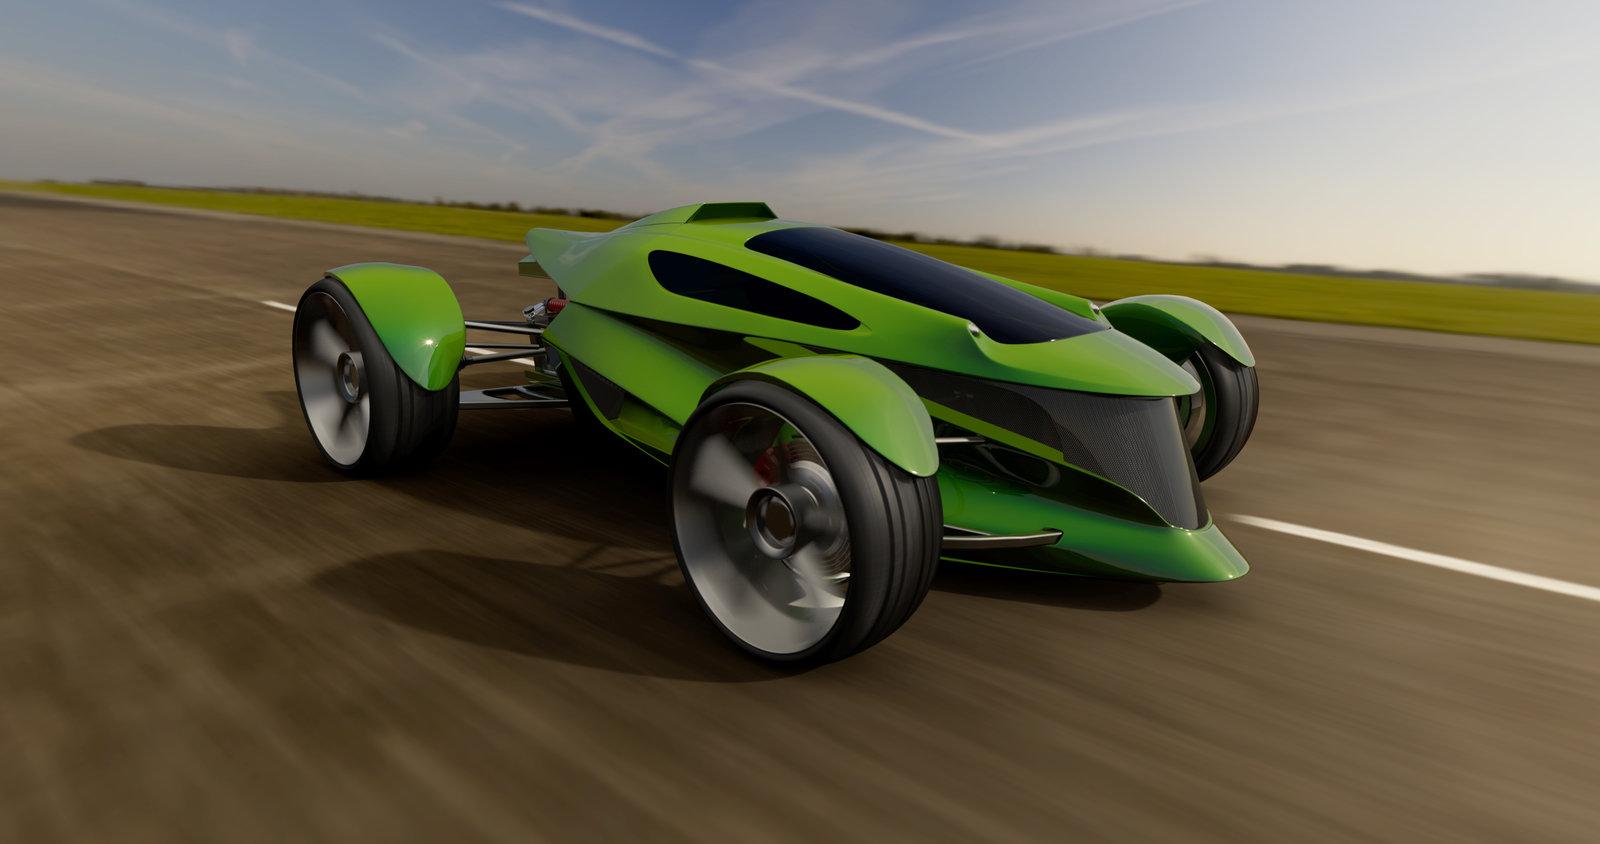 Tandem Concept Vehicle